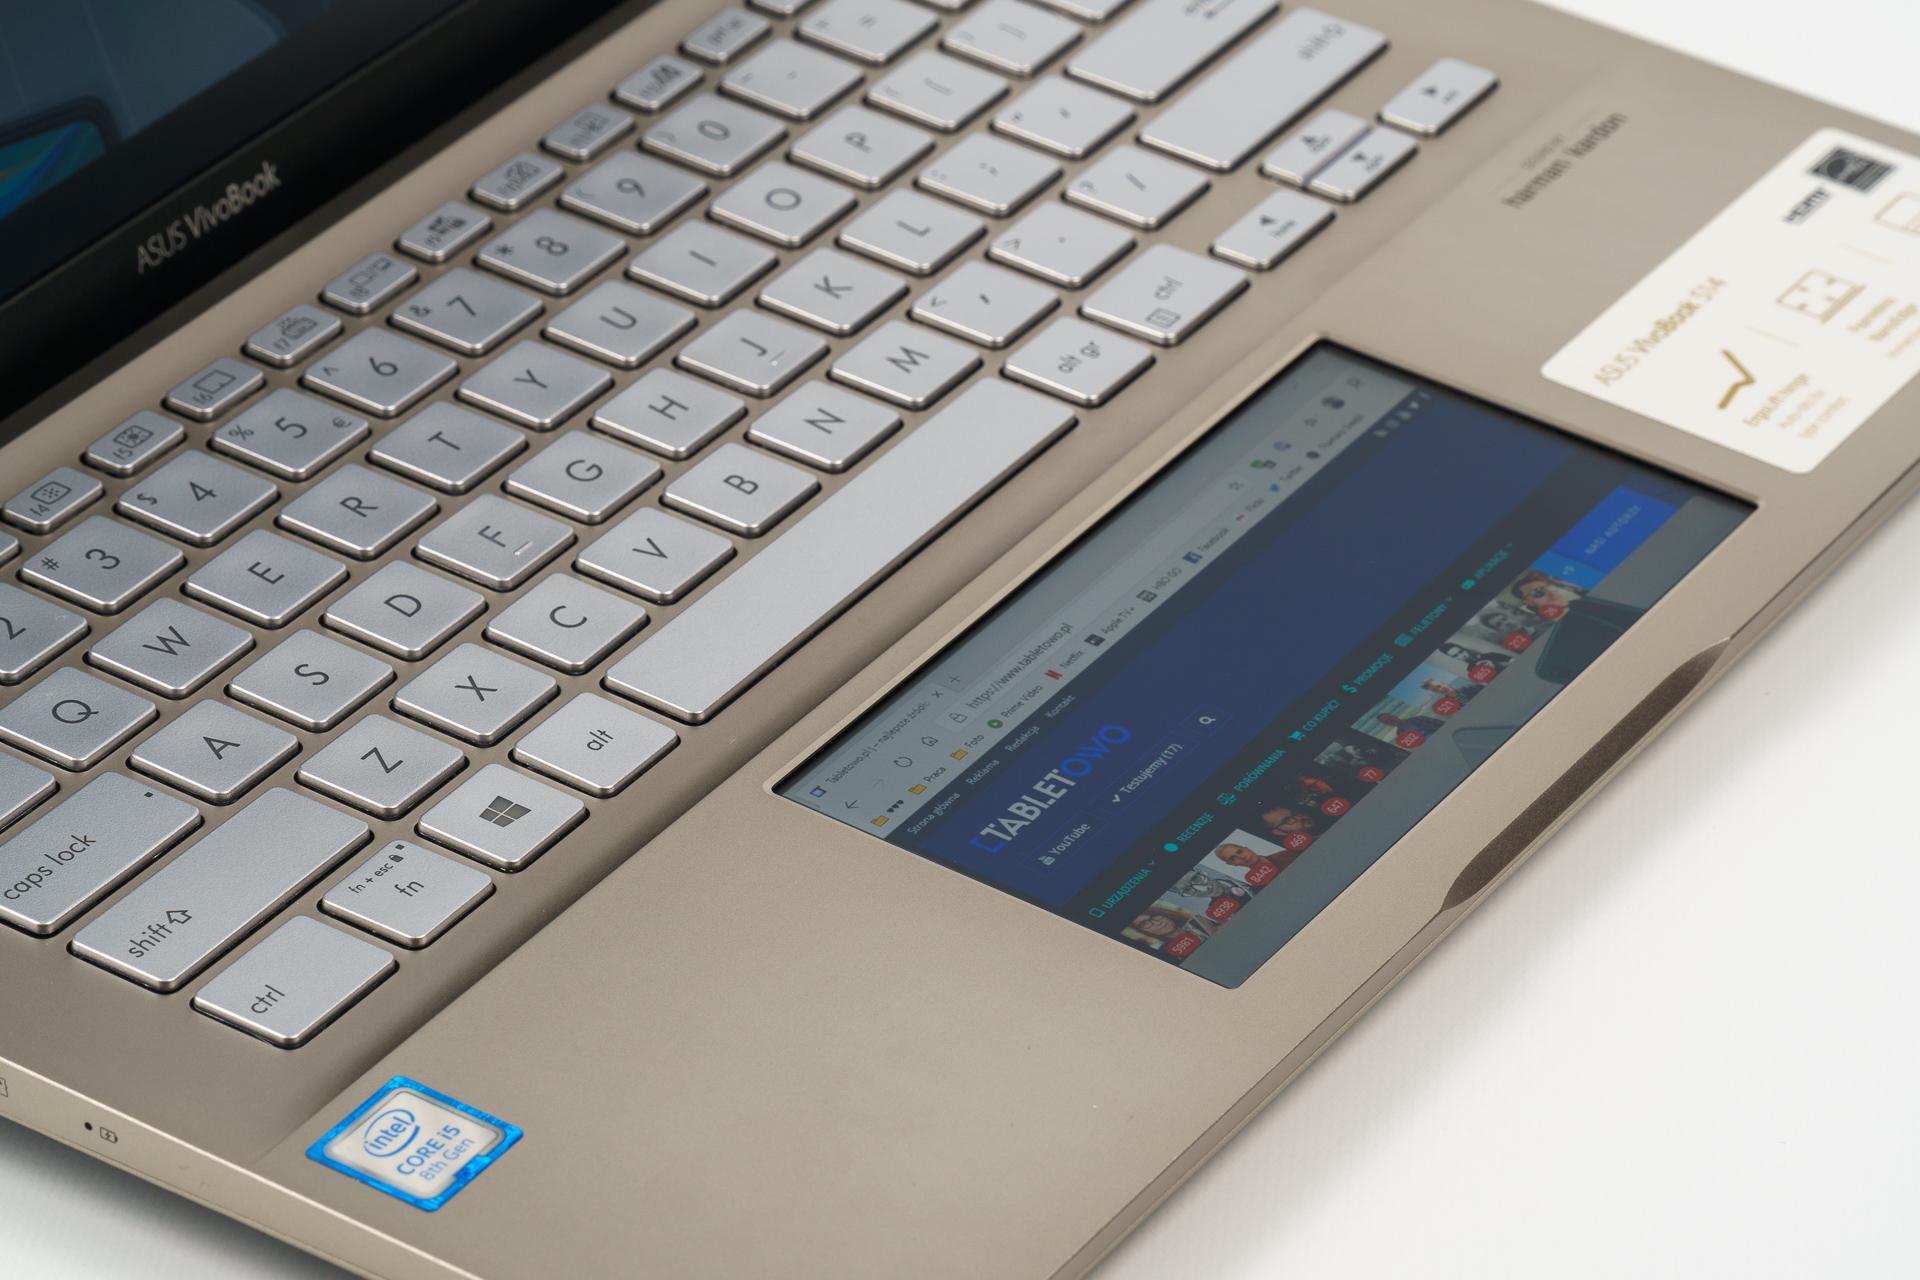 Asus VivoBook ze ScreenPadem, czyli po co w notebooku drugi ekran? 29